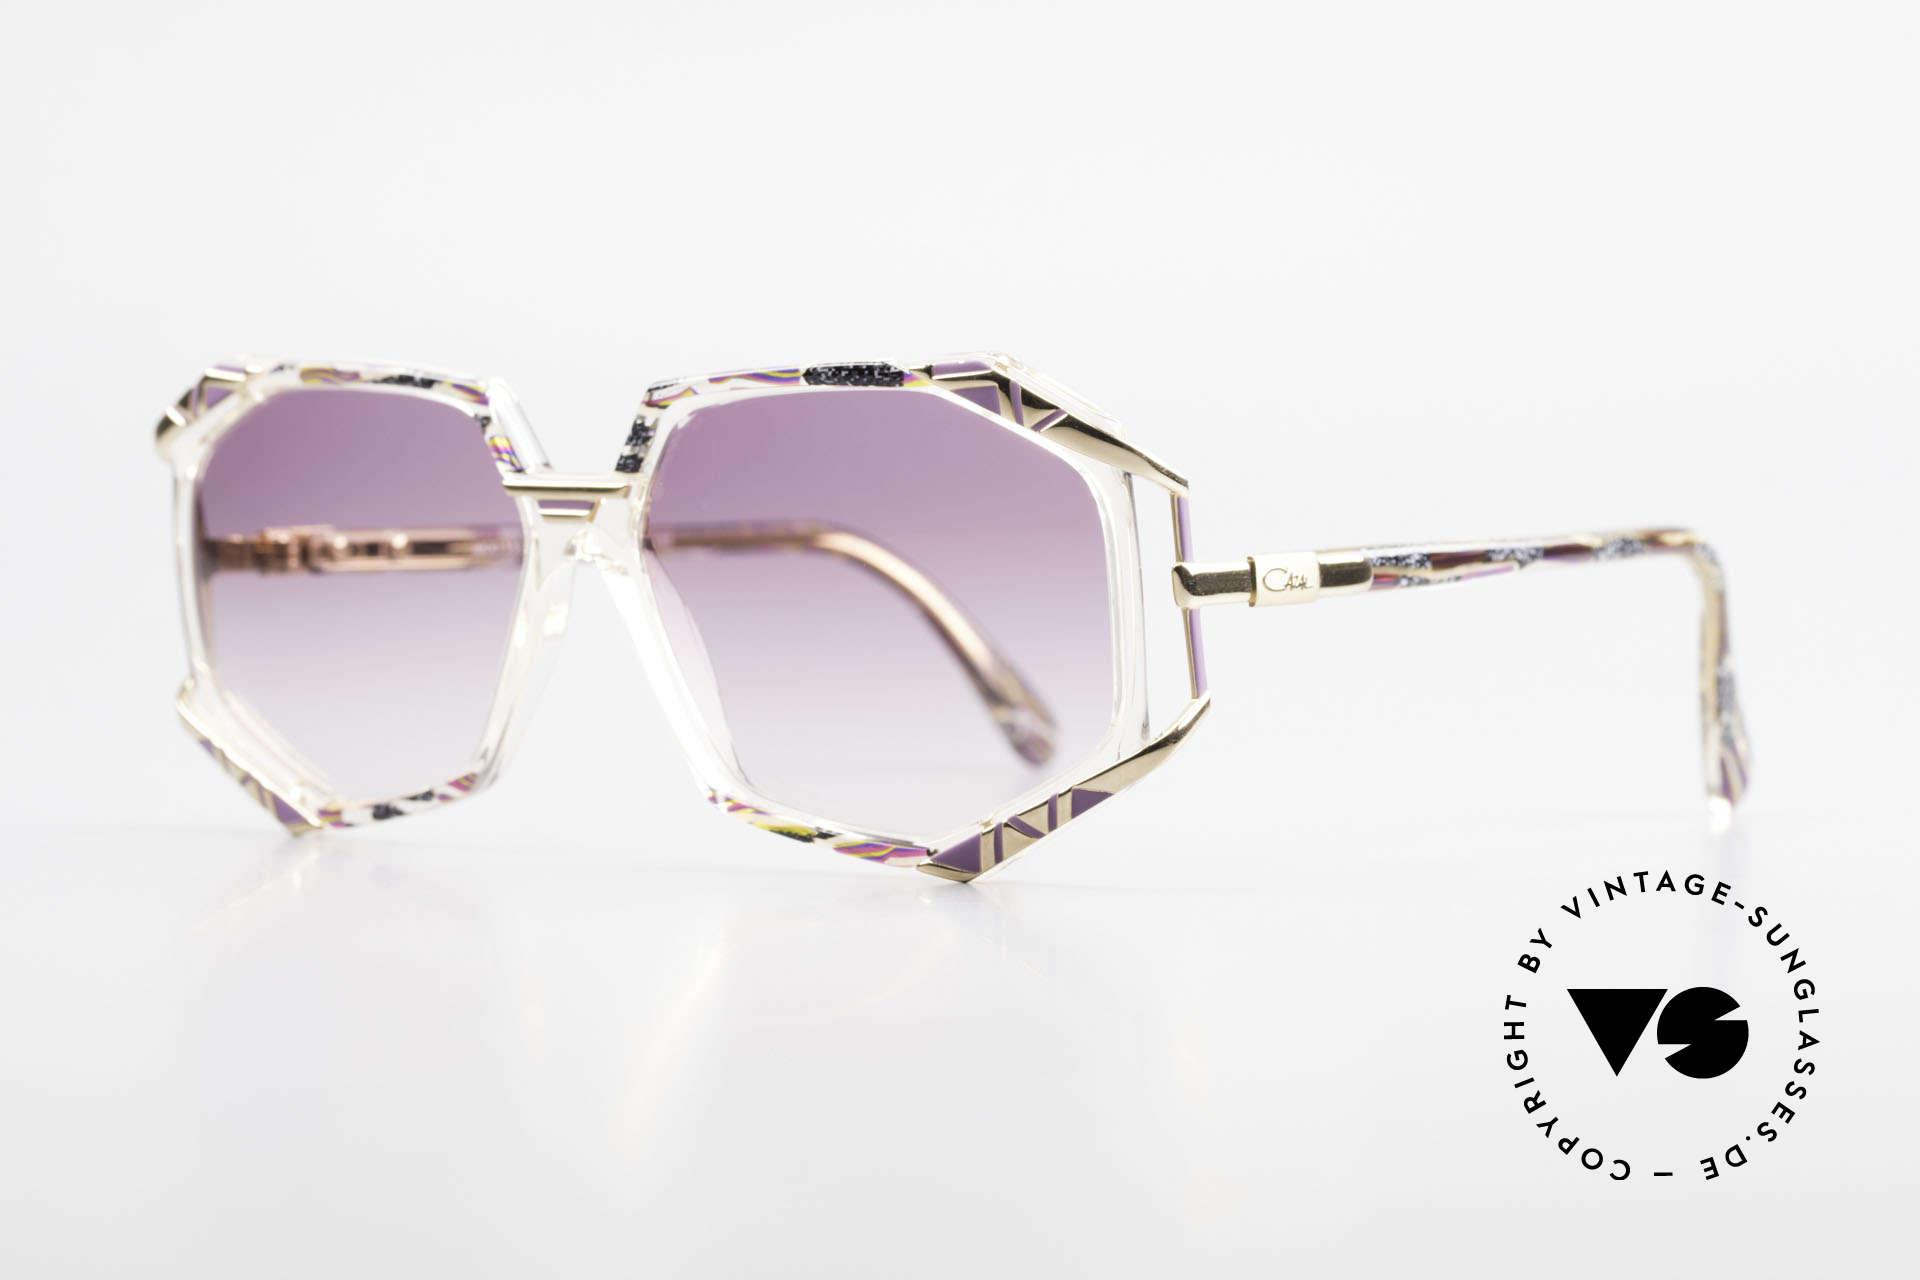 Cazal 355 Extraordinary 90's Cazal Frame, terrific frame pattern by CAri ZALloni (check the pics!), Made for Women